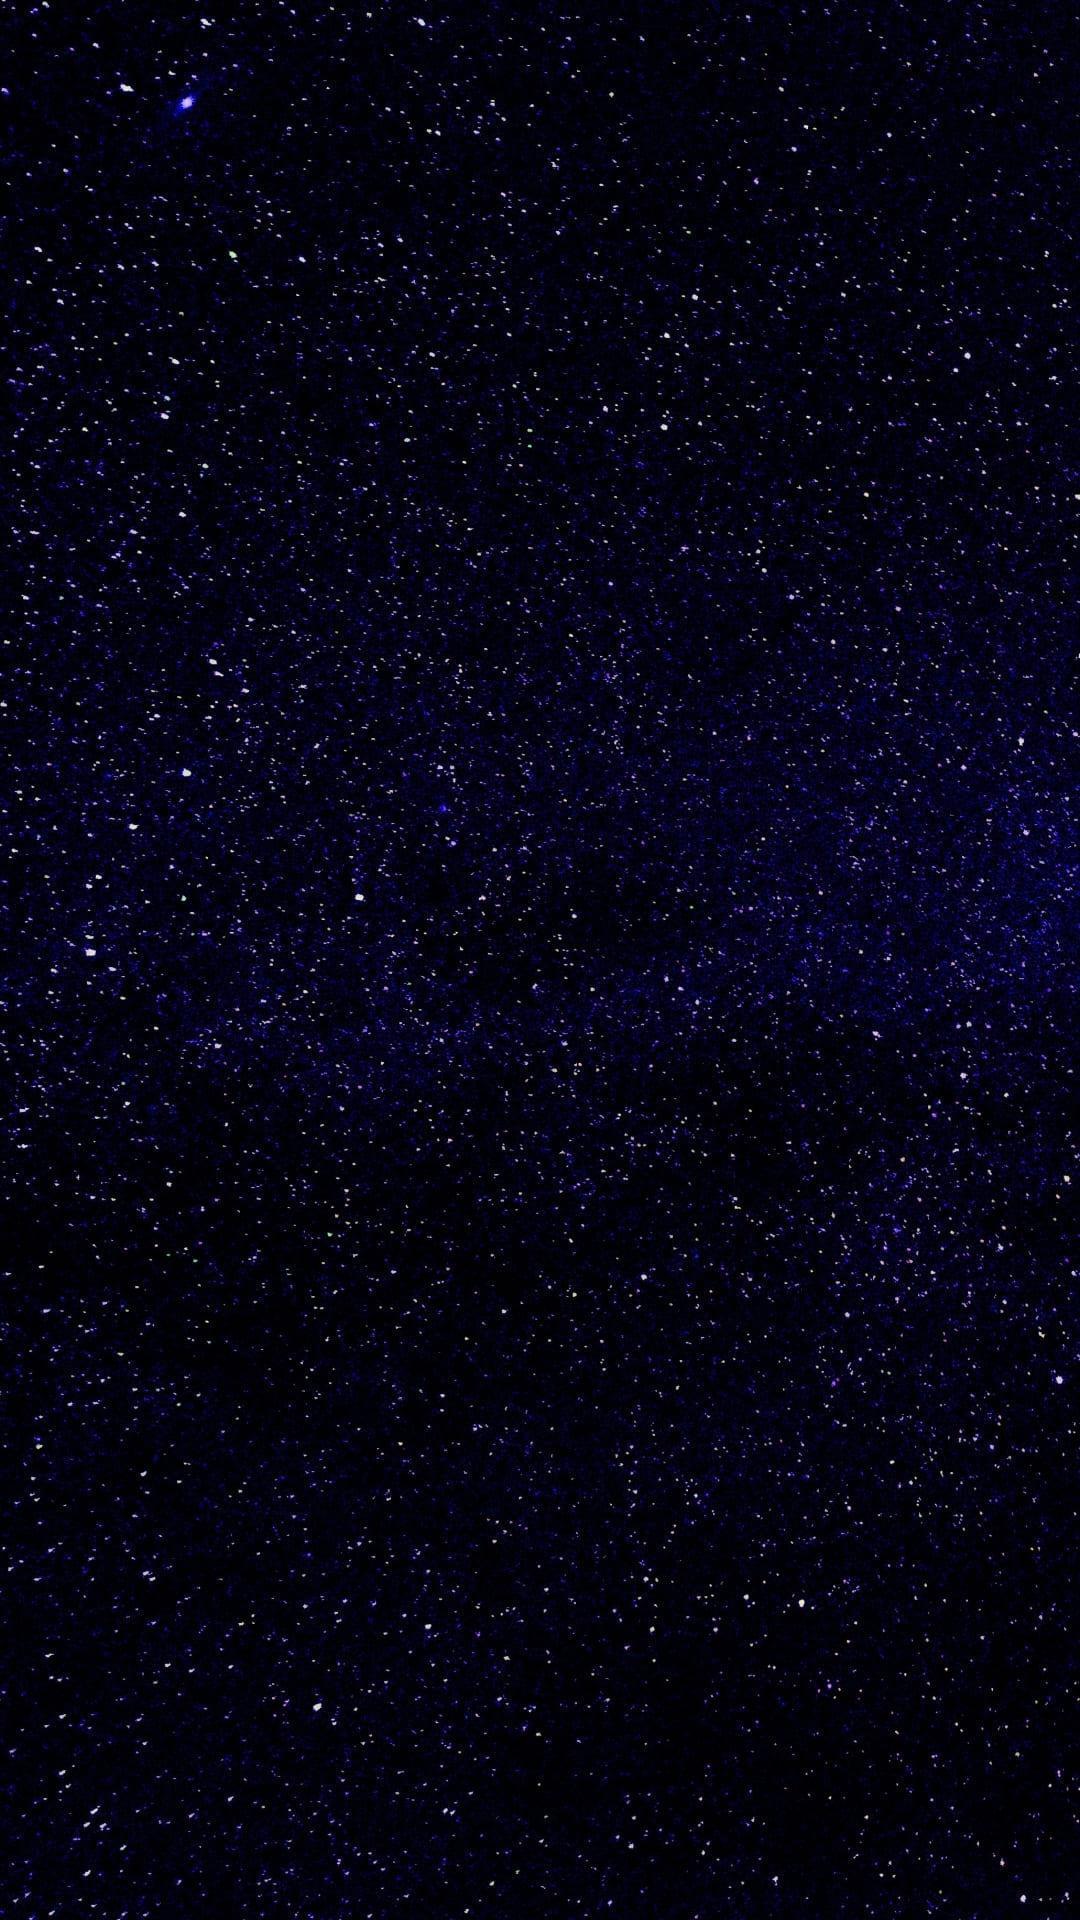 обои на телефон галактика космос